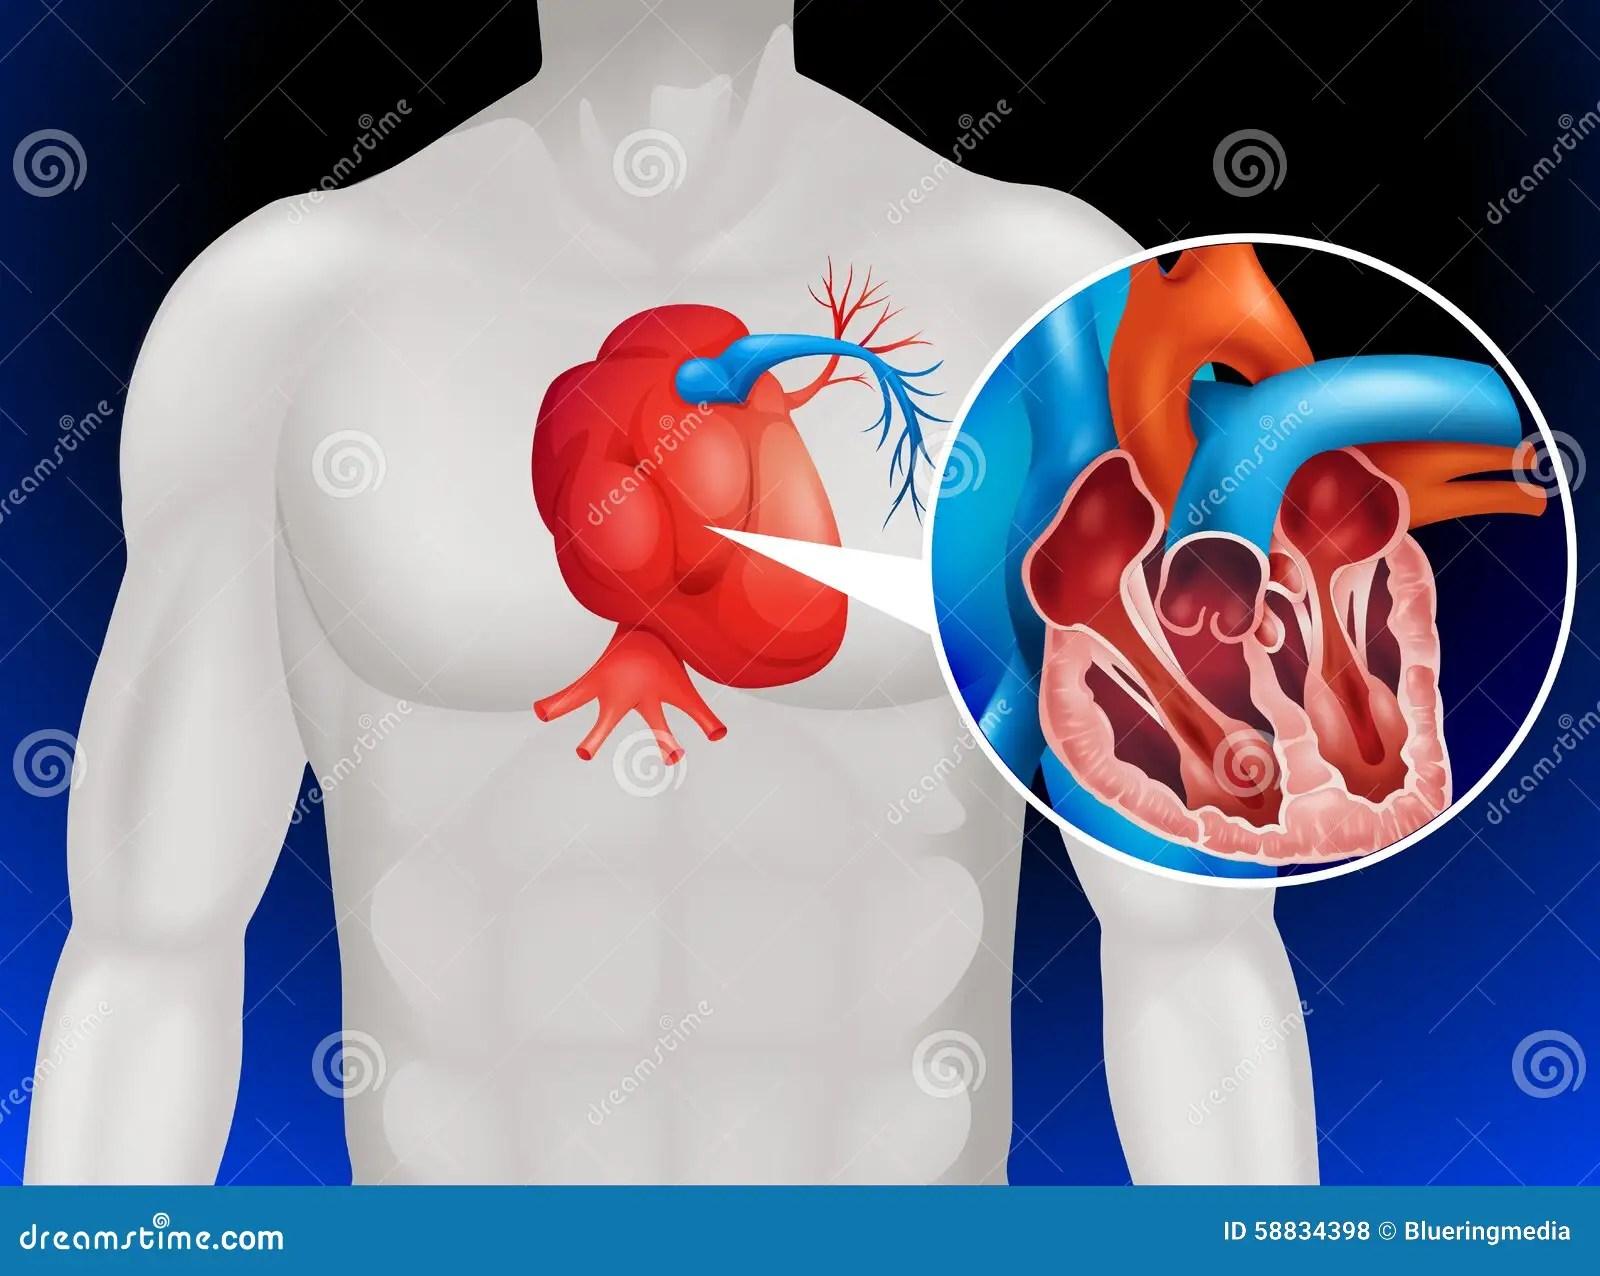 hight resolution of heart disease diagram in detail